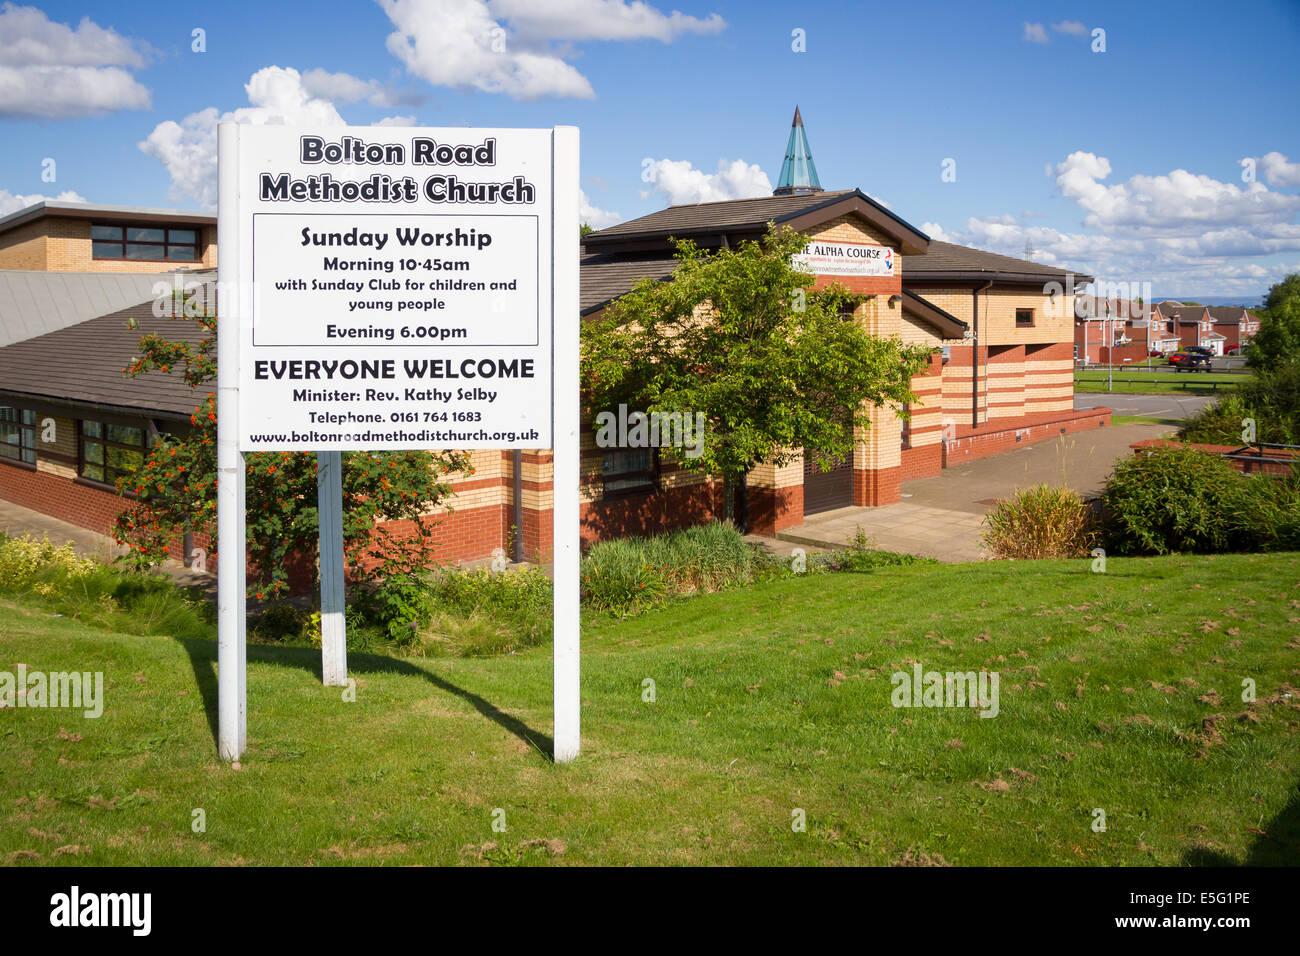 Bolton Road Methodist Church in Bury, Lancashire - Stock Image